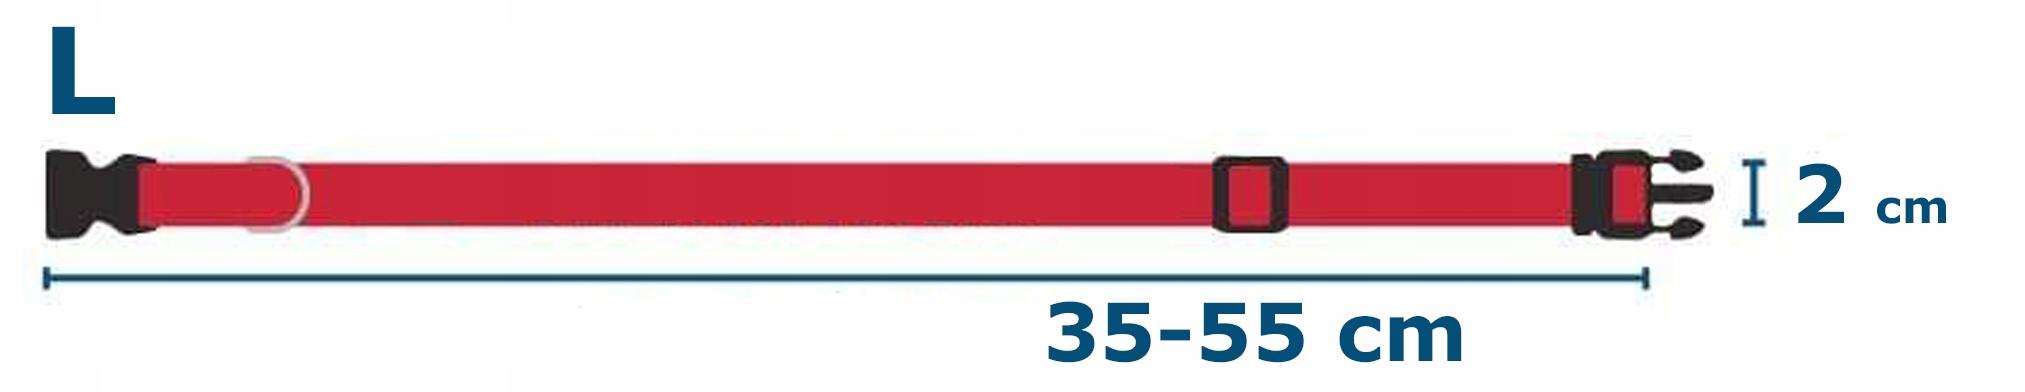 SOLIDNA OBROŻA TAŚMOWA REGULACJA 2x35/55 cm L Kod producenta JW-0404-L-SZARY